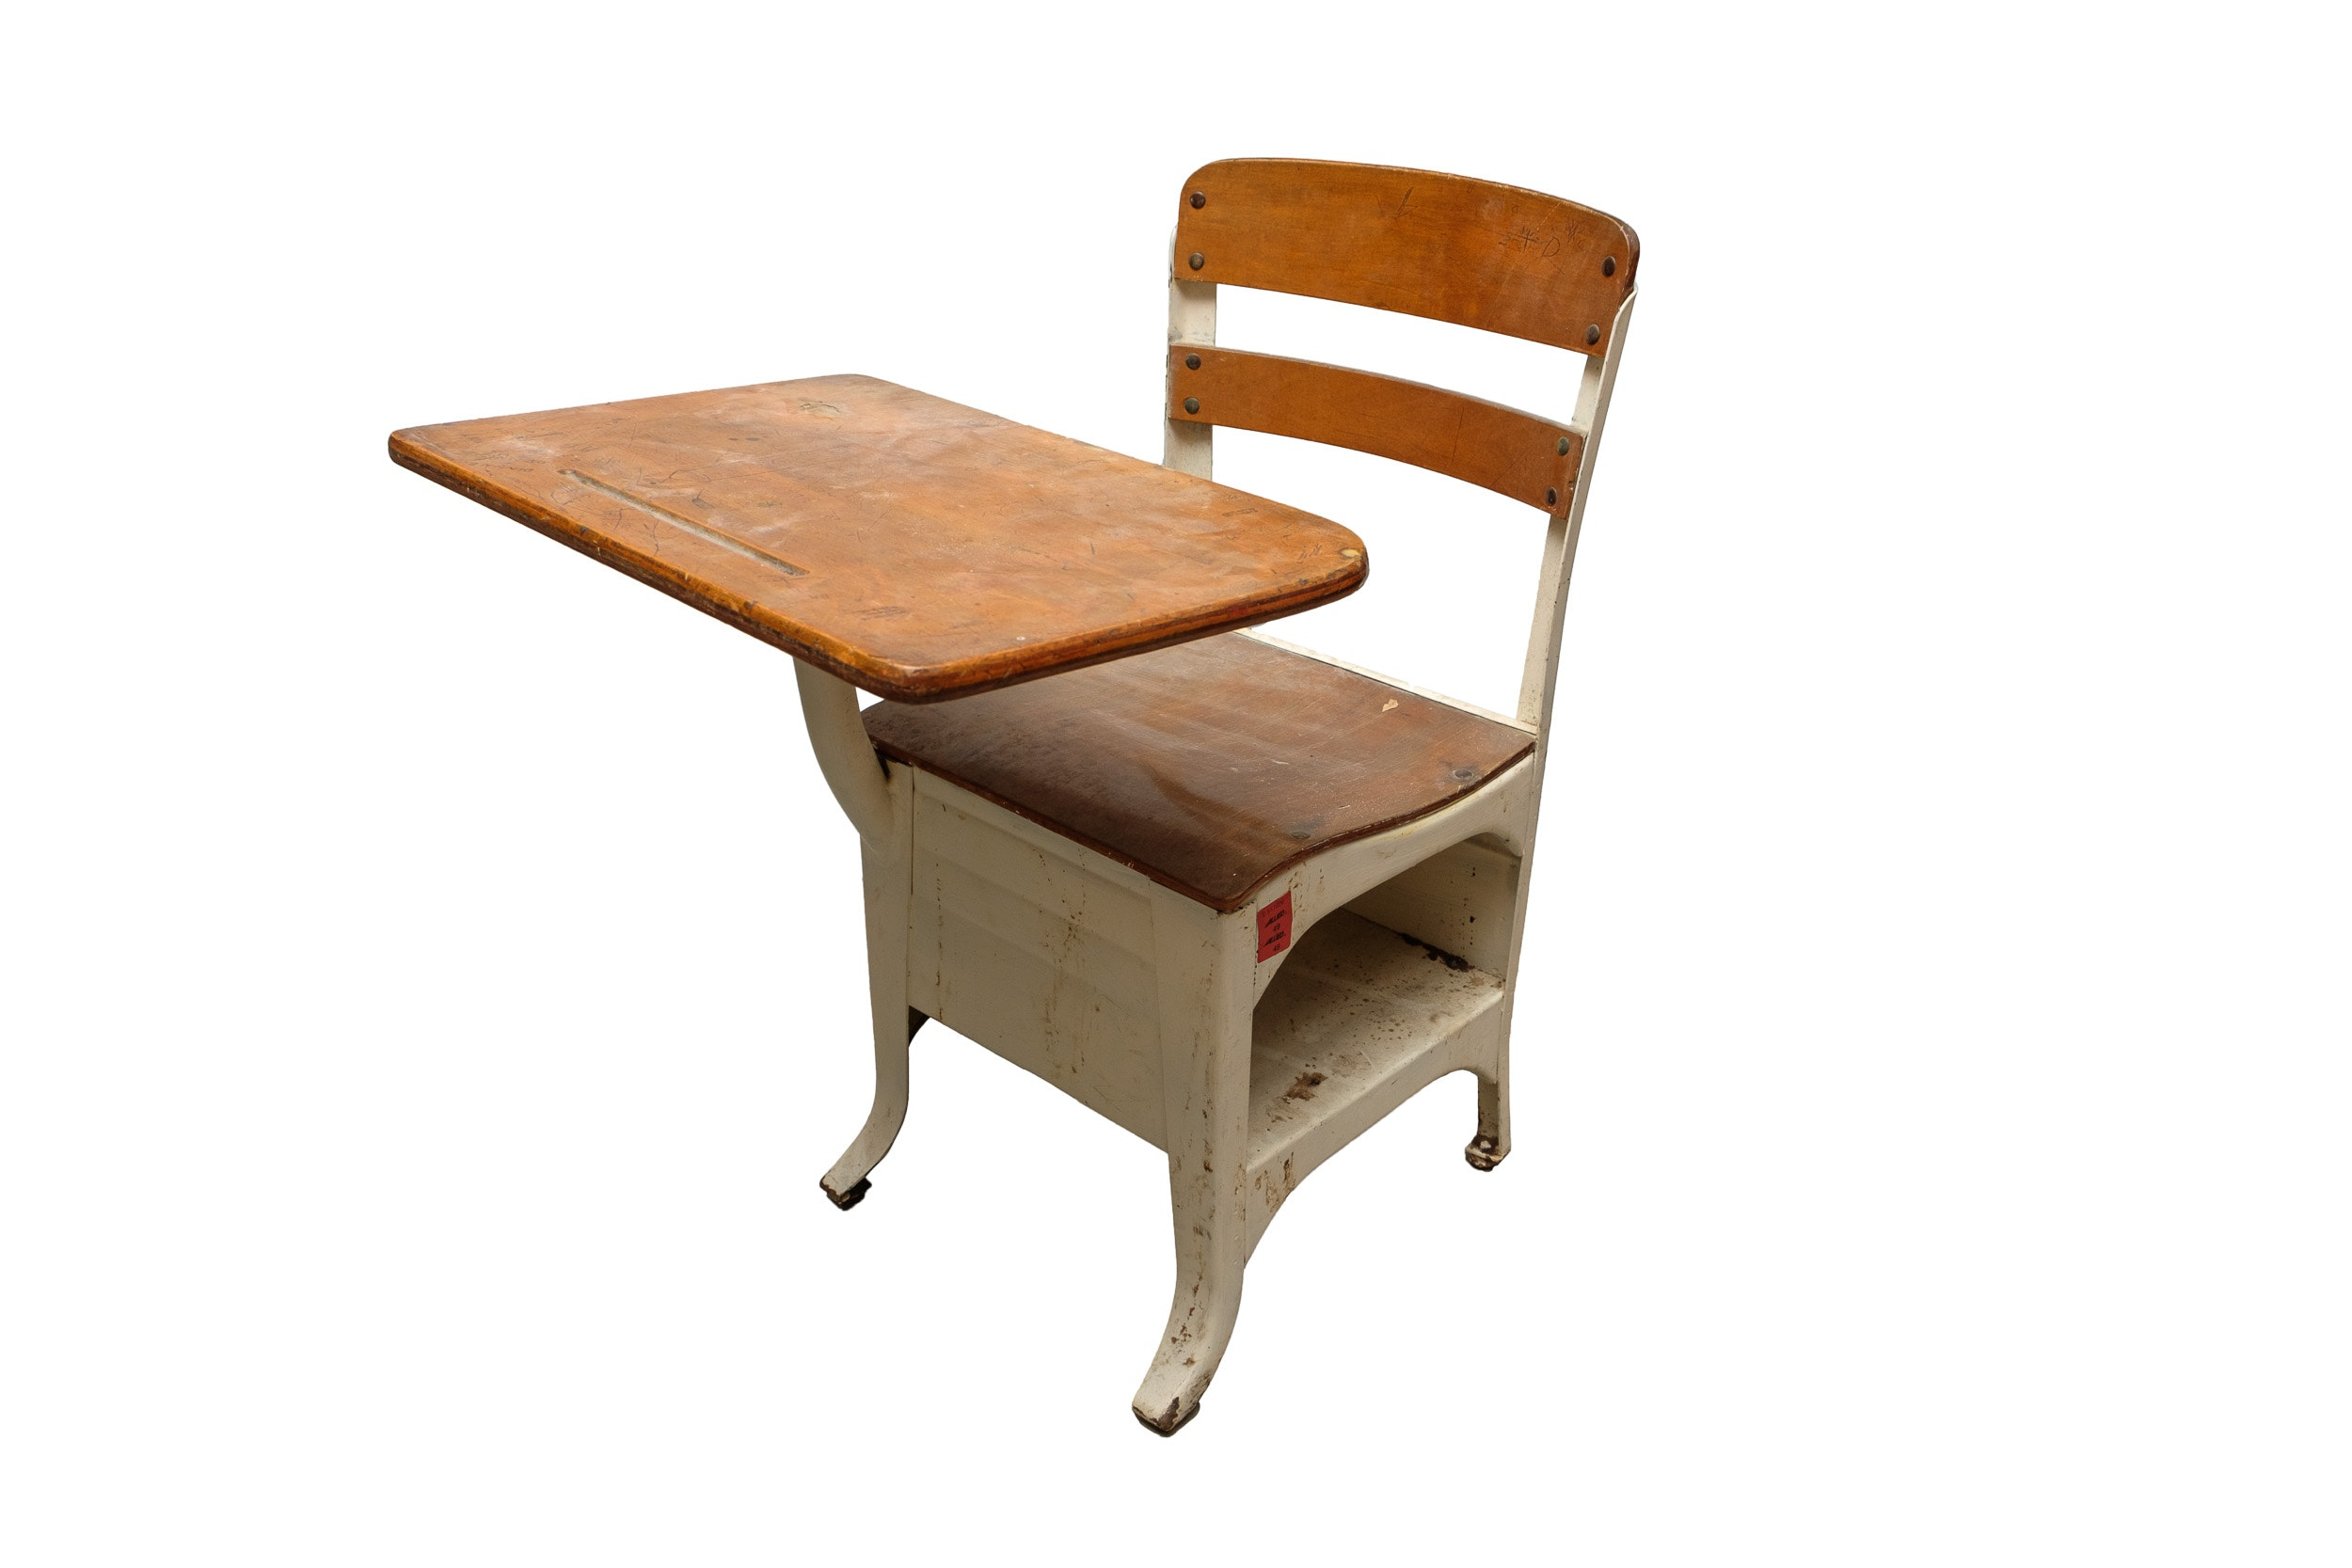 Vintage Metal and Maple School Desk